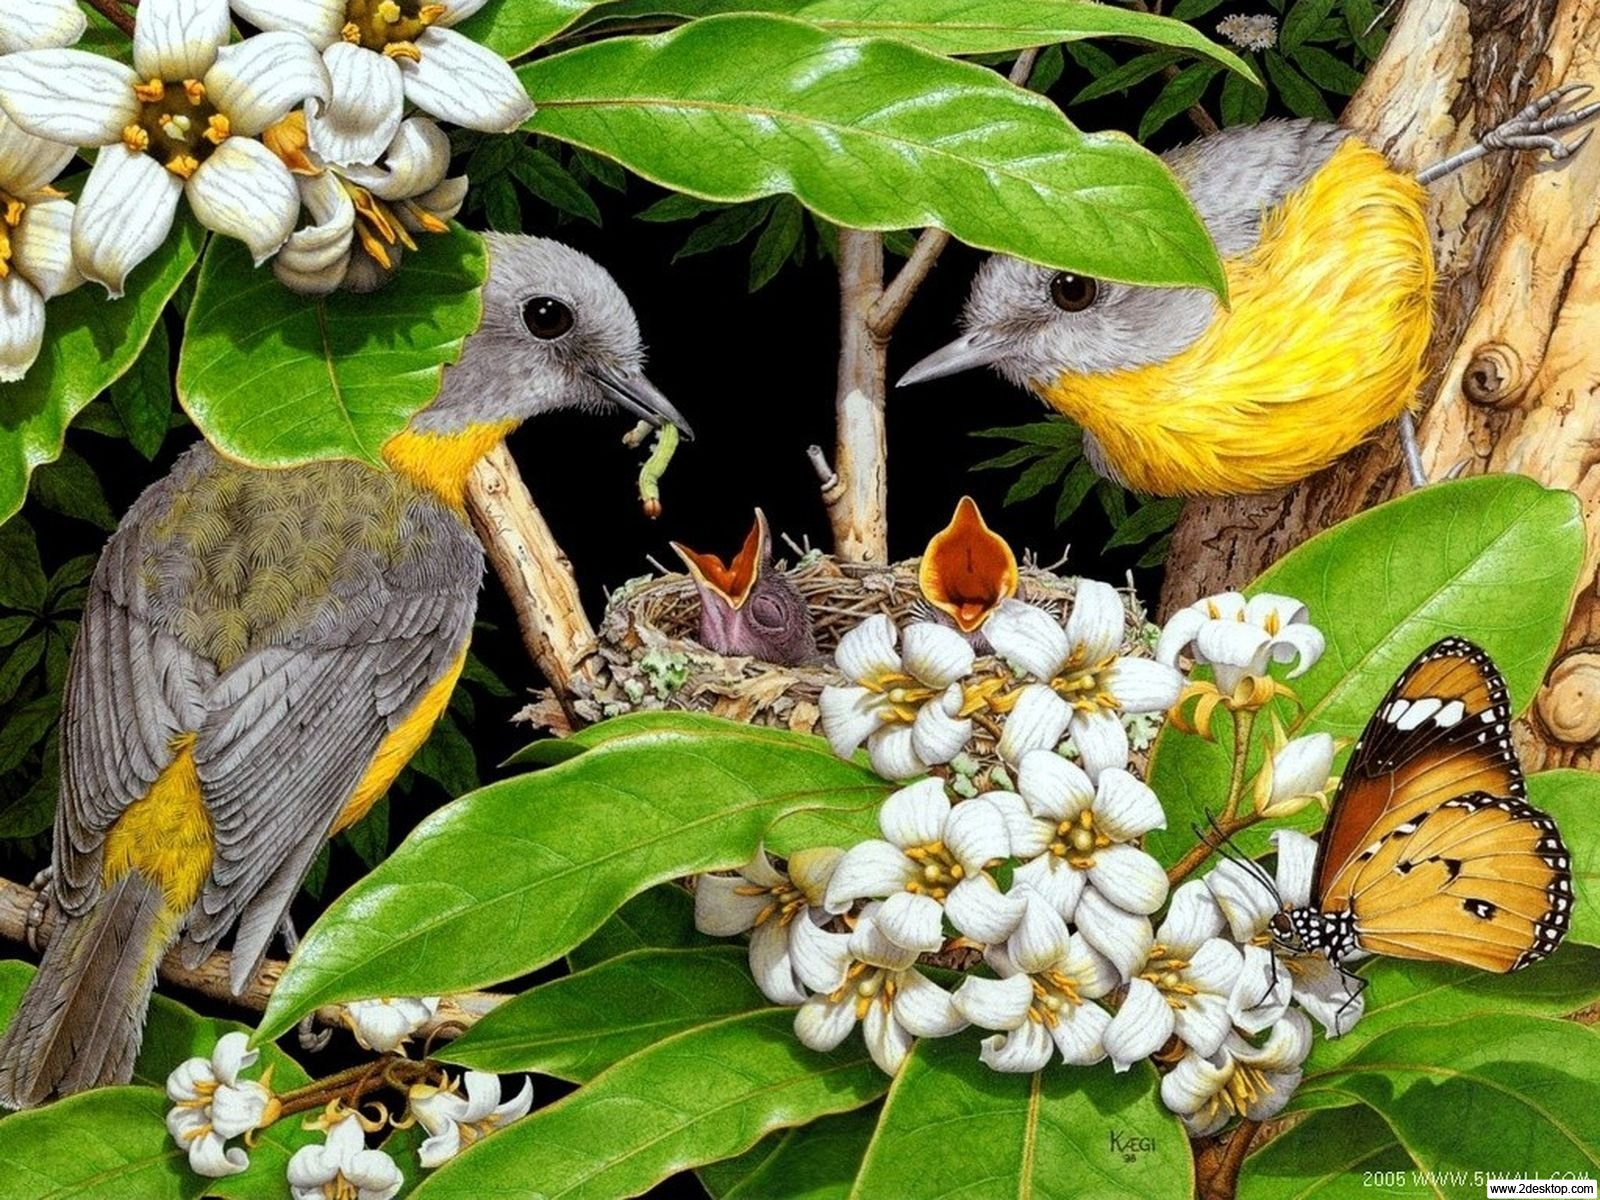 http://2.bp.blogspot.com/-EhXWSev0xxY/Tka-jFP-YlI/AAAAAAAACEw/8gDU0uJDz6A/s1600/Birds-Wallpapers_www-free-wall-paper-com-1.jpg